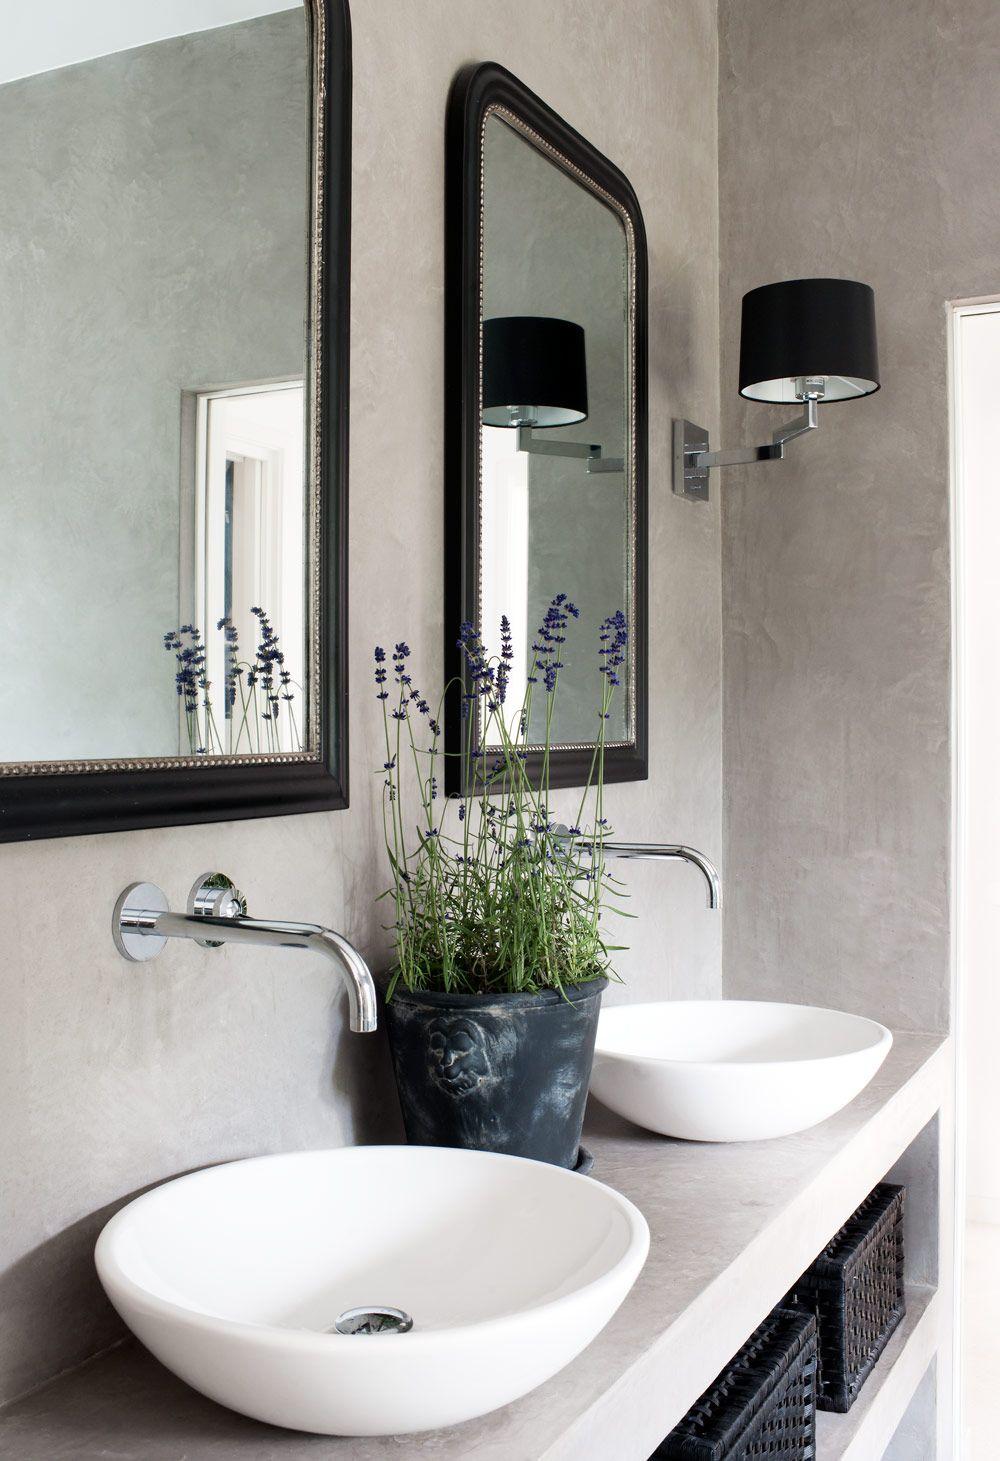 Kind Of Love These Bathroom Sinks Have Always Liked The Raised